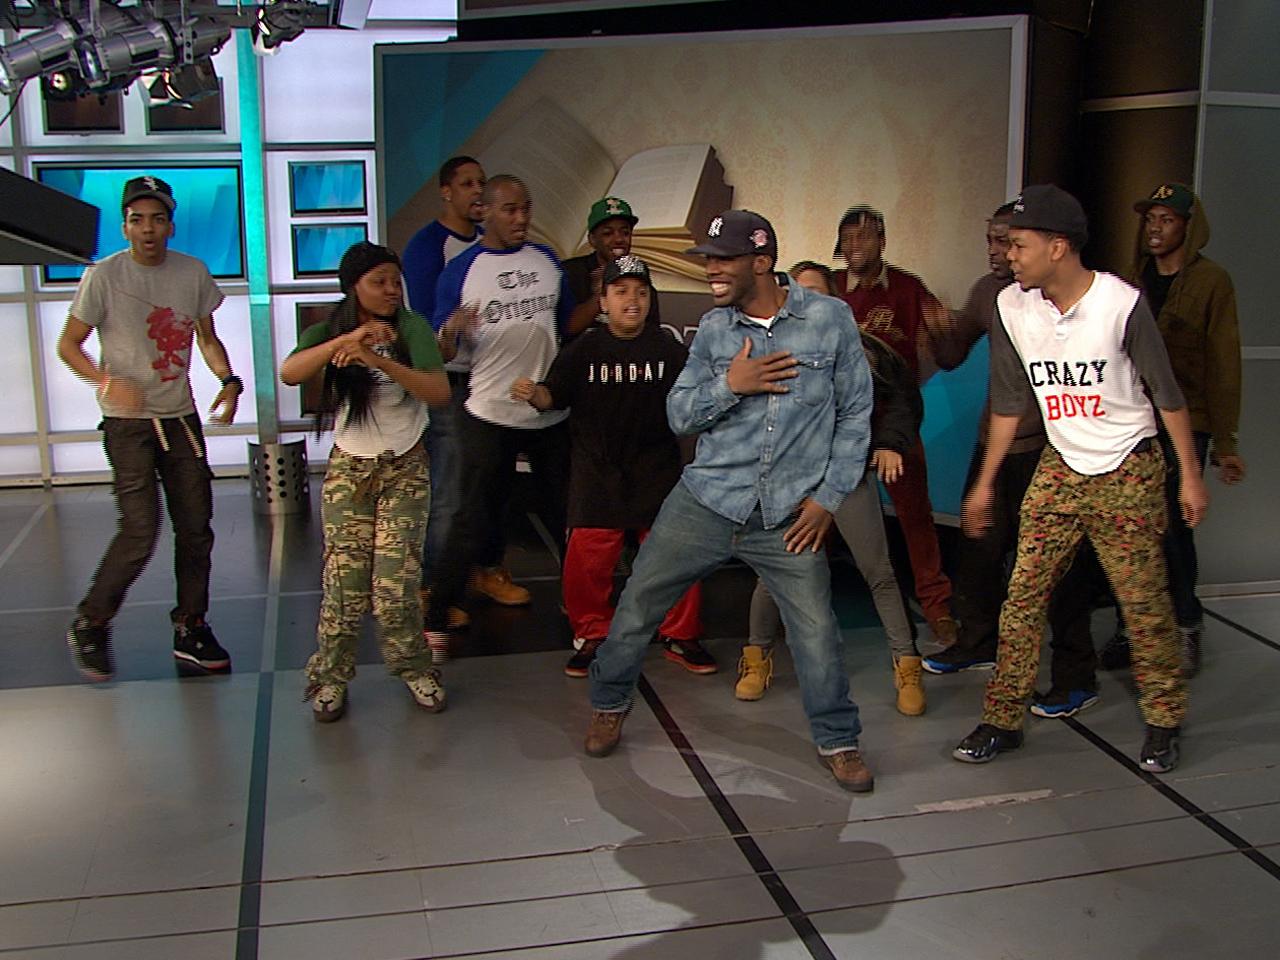 Harlem Shake' craze needs historical, cultural context | MSNBC